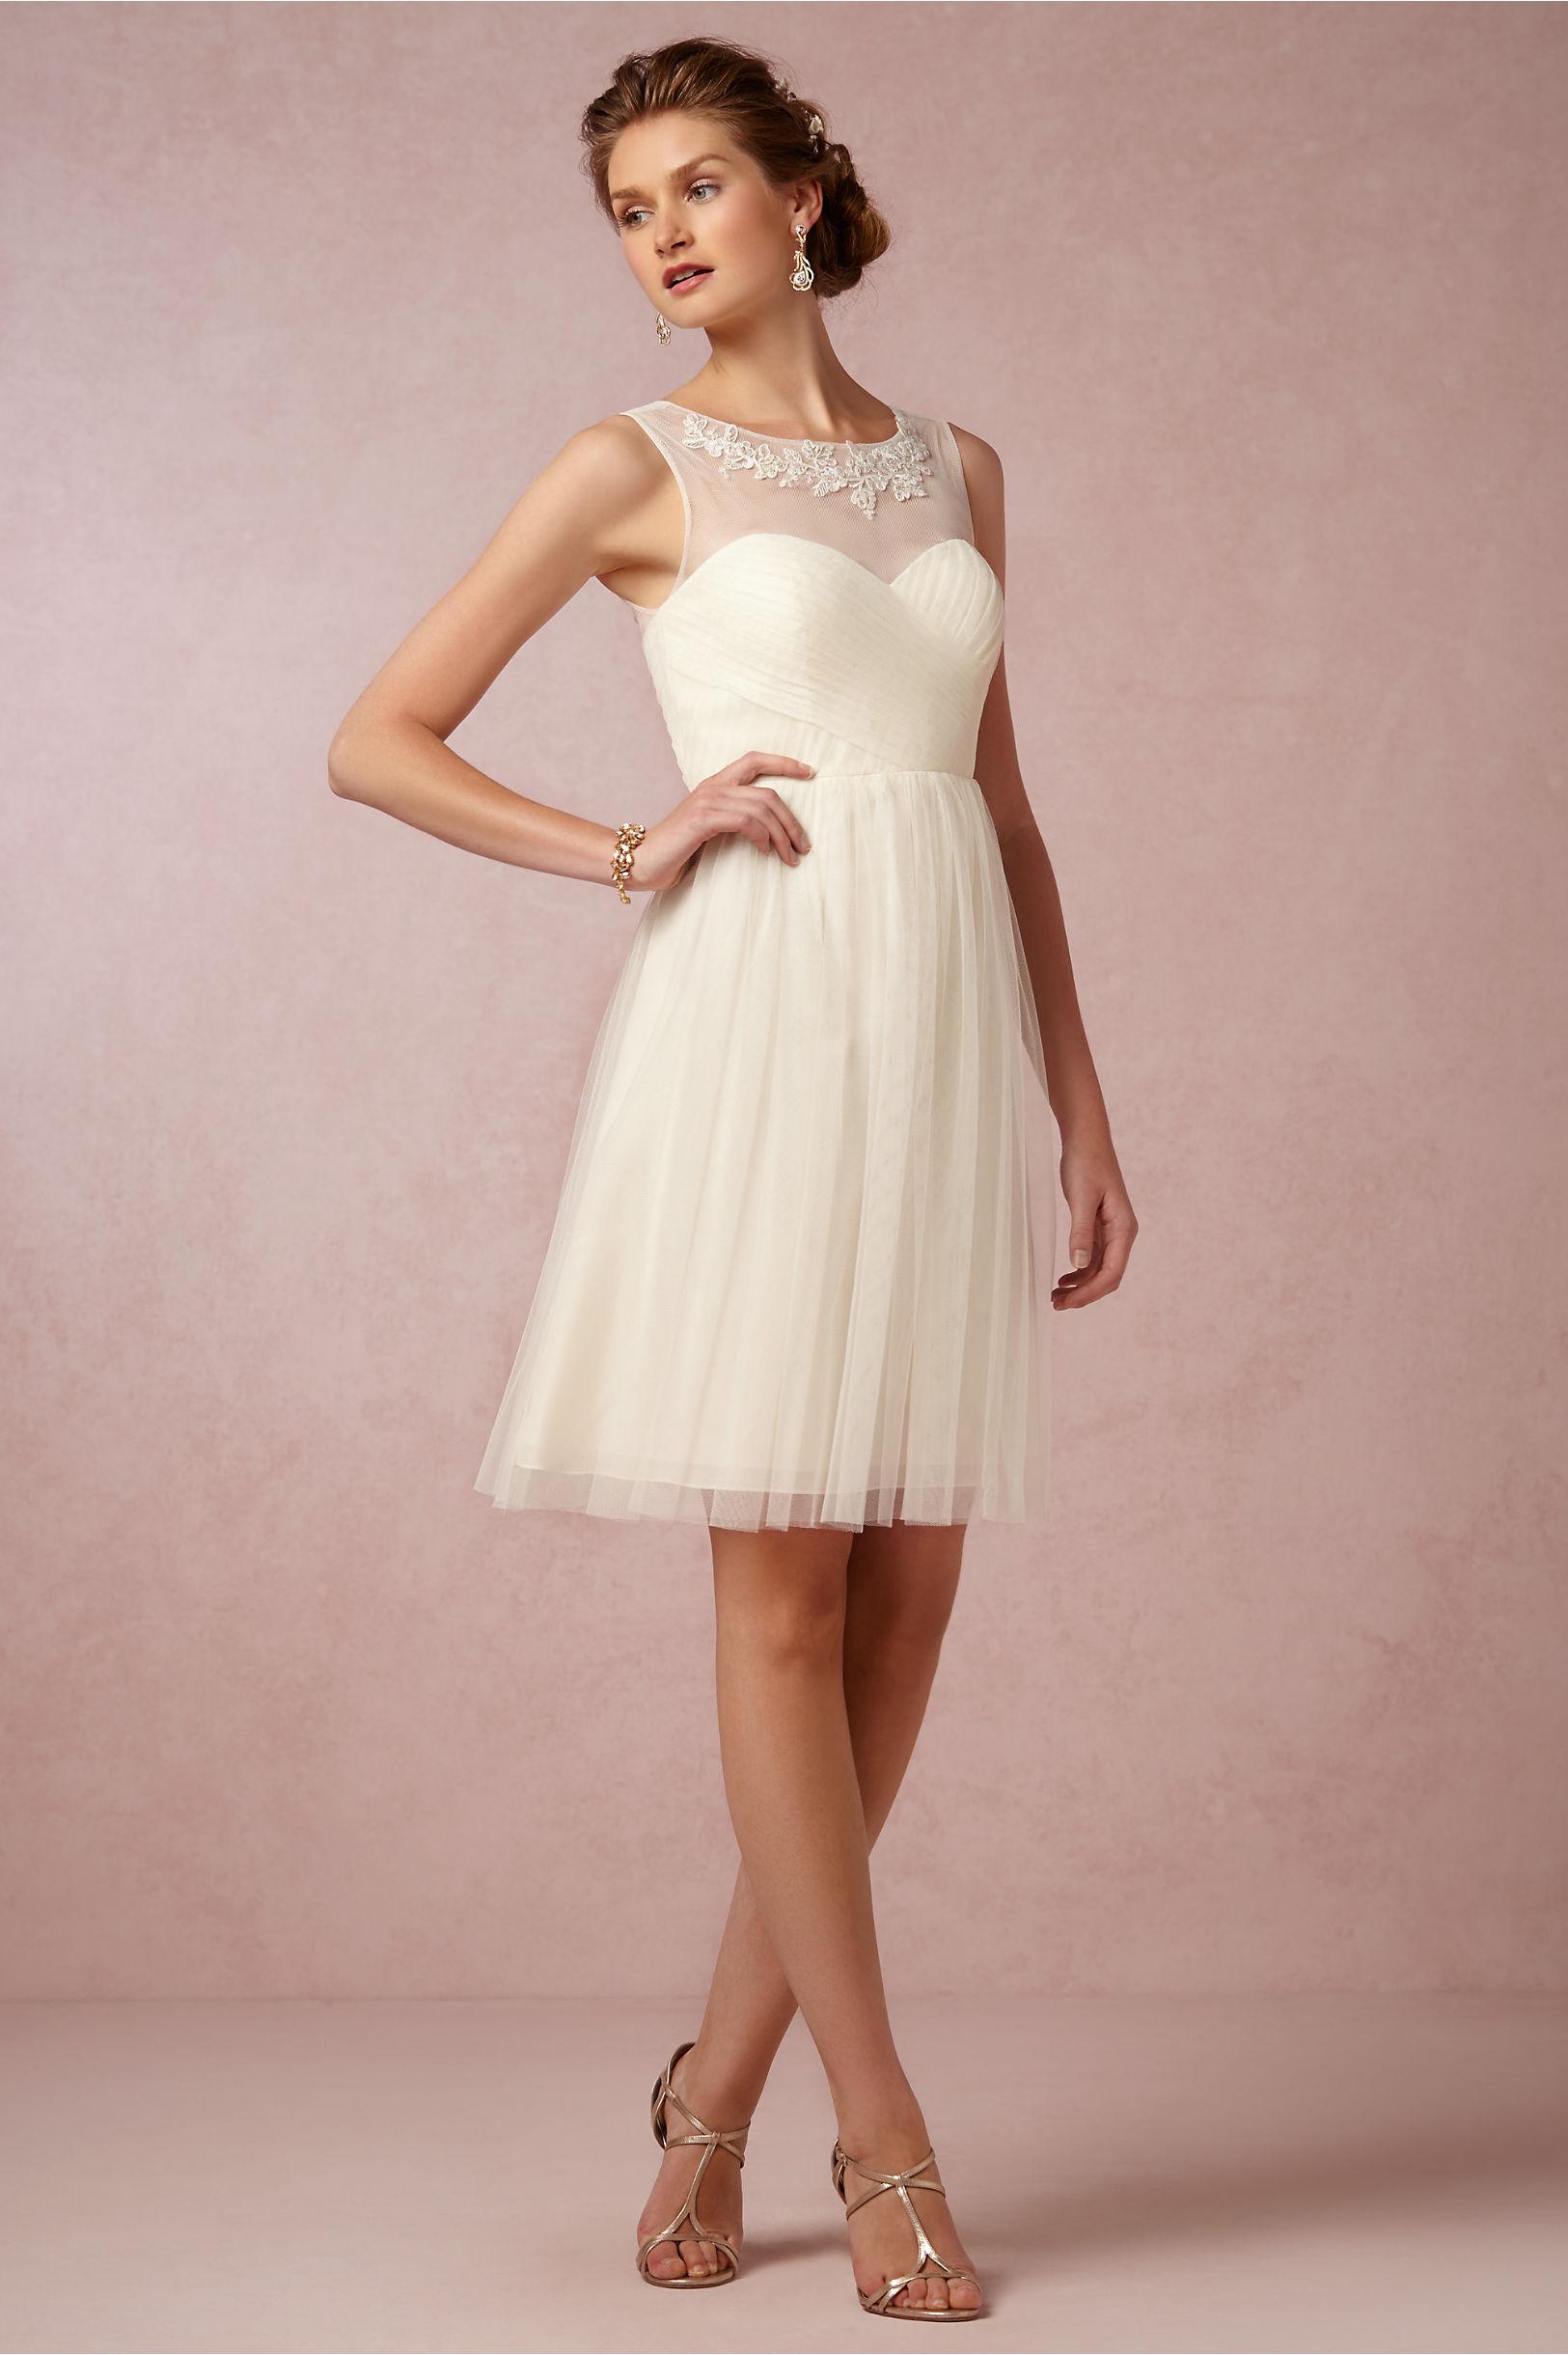 chloe wedding dresses photo - 1